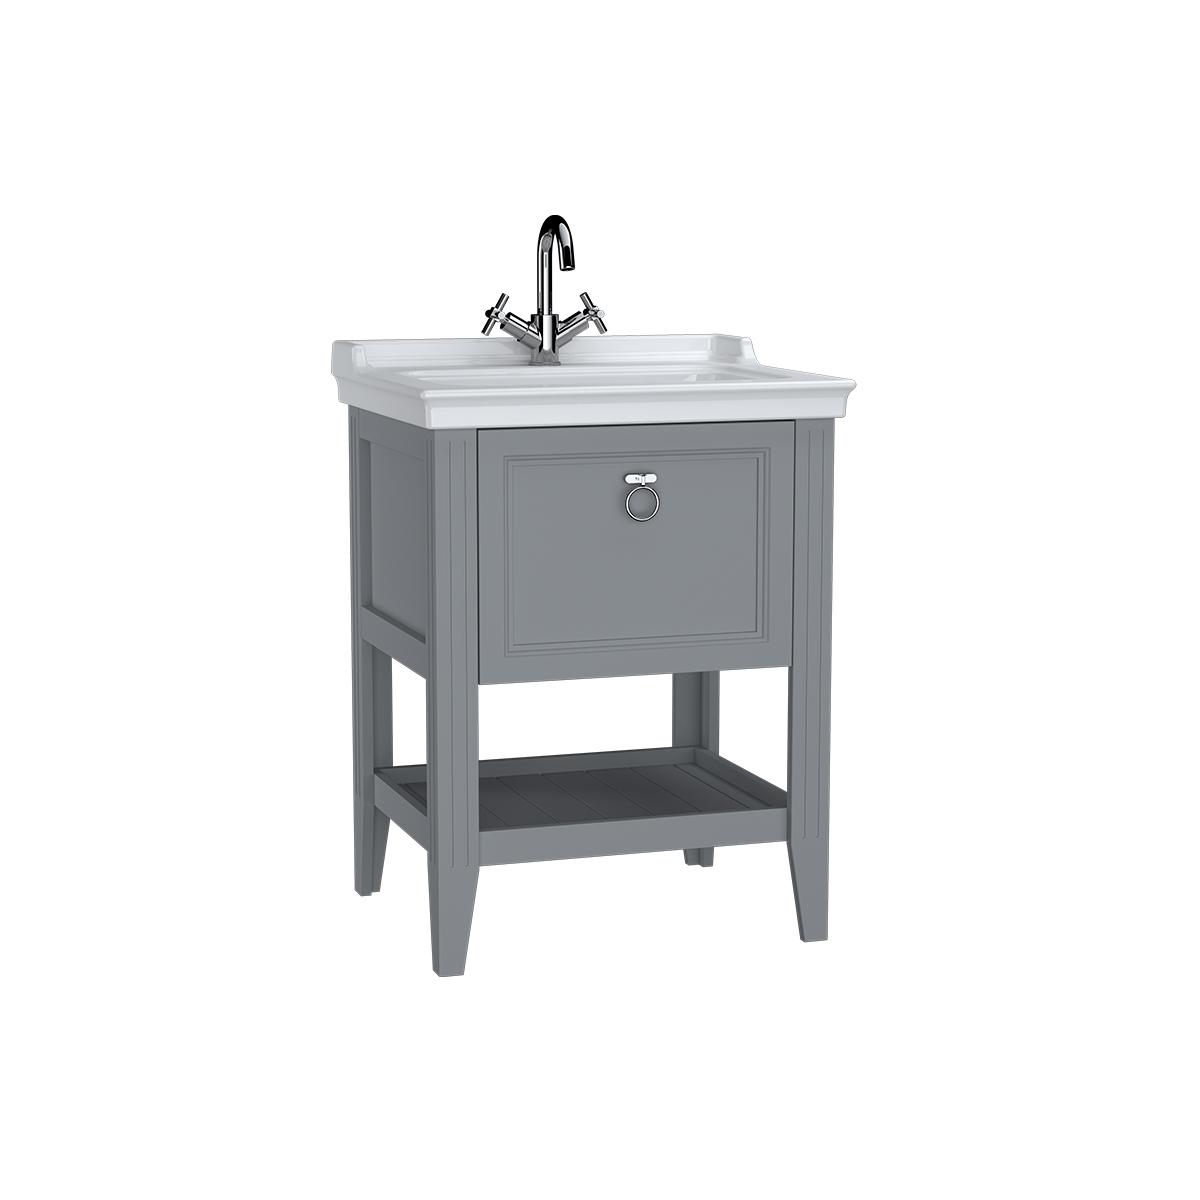 Valarte meuble avec plan céramique, 65 cm, avec tiror, gris mat